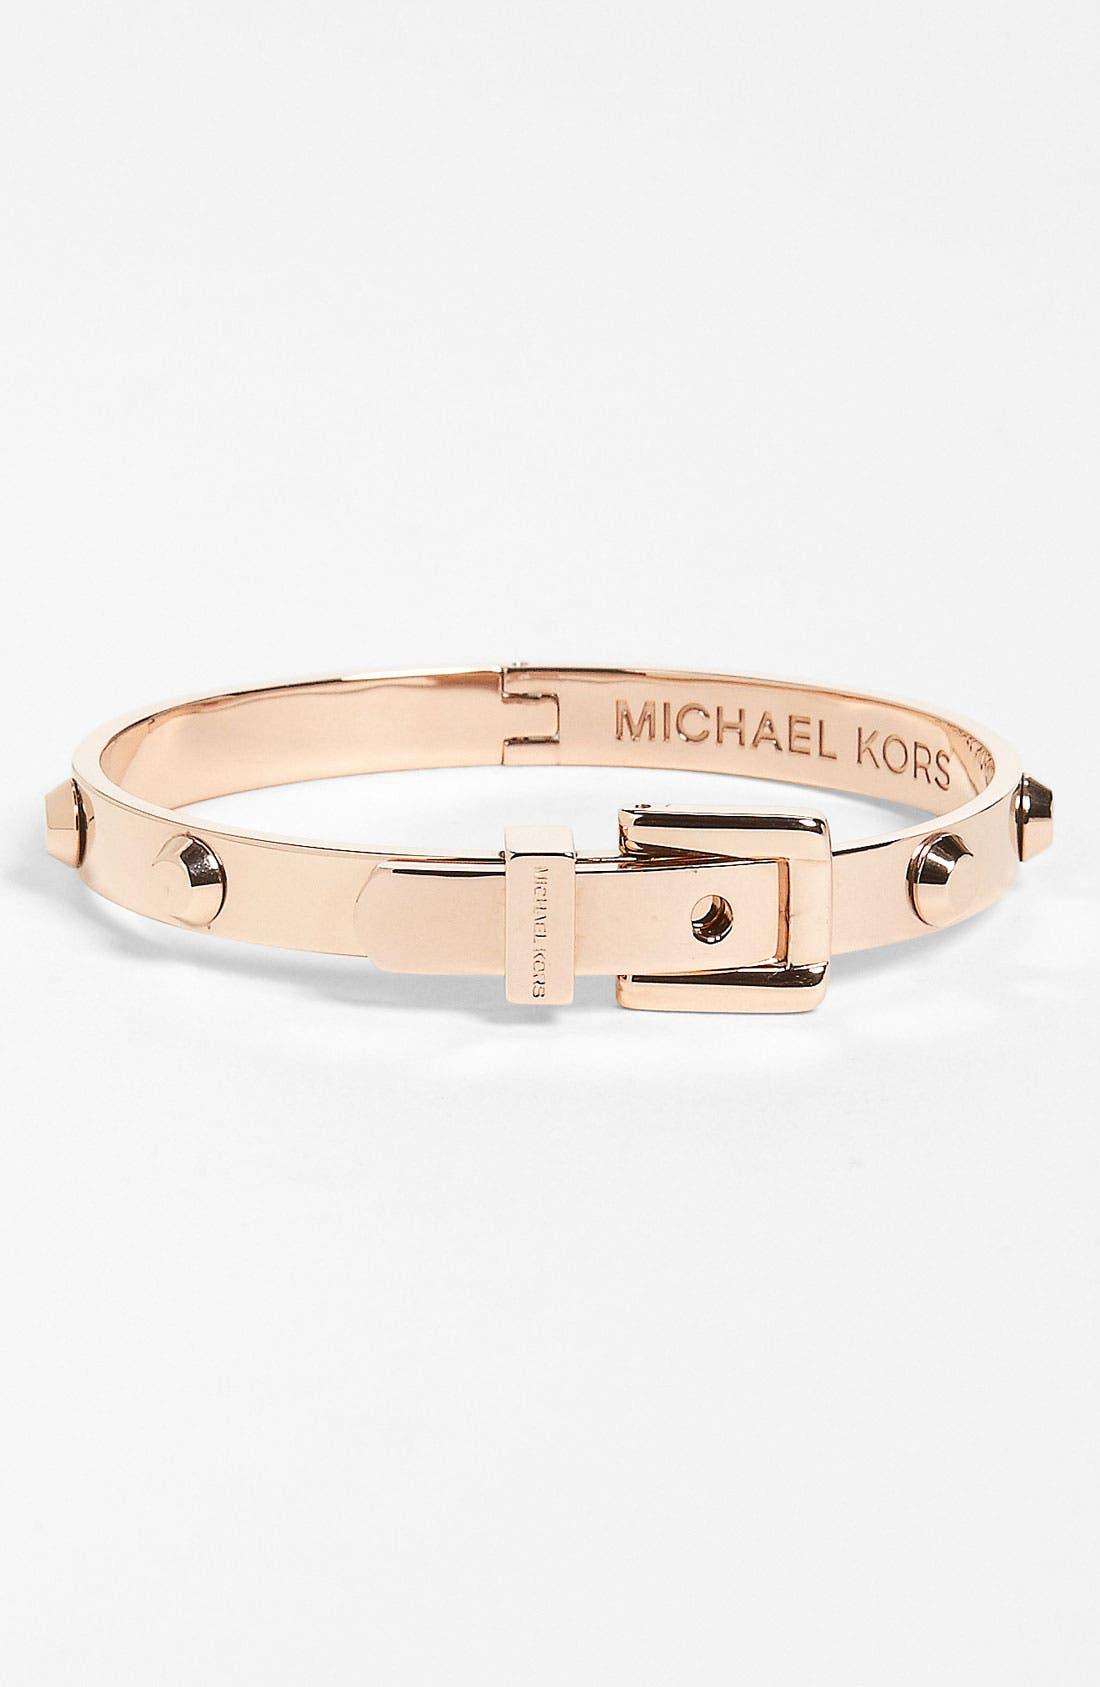 Alternate Image 1 Selected - Michael Kors 'Astor' Buckle Bangle